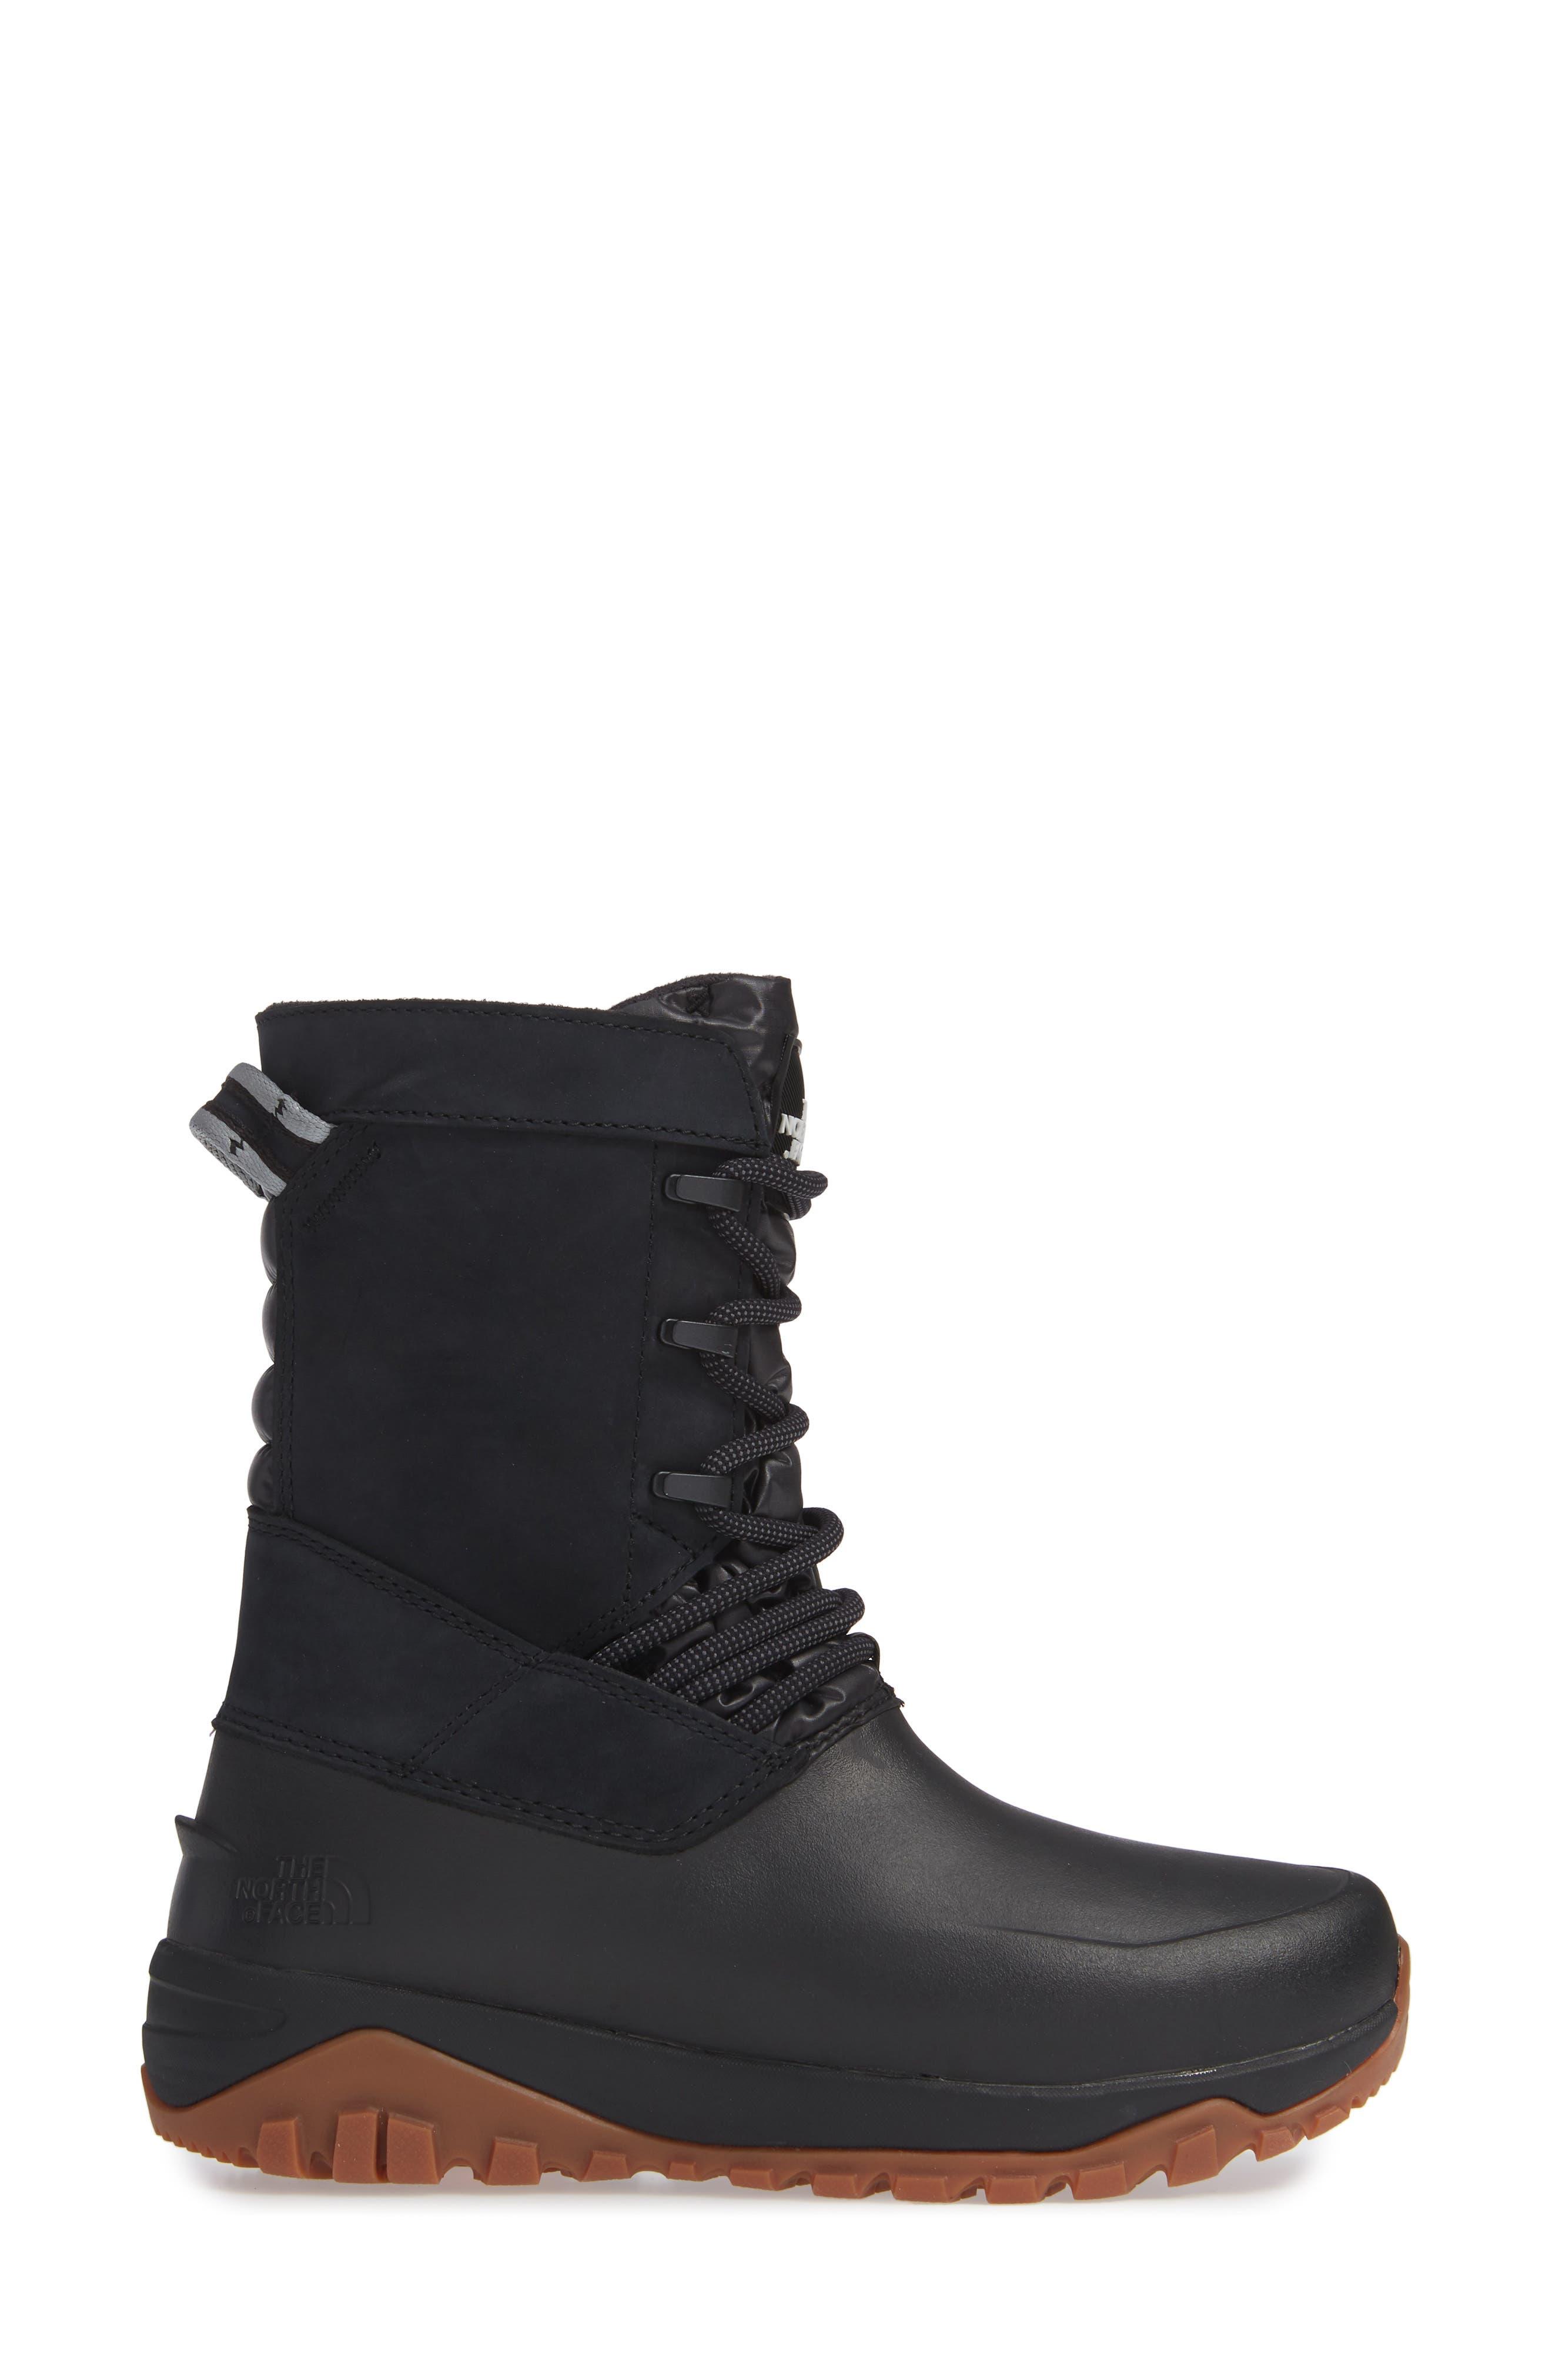 Yukiona Waterproof Winter Boot,                             Alternate thumbnail 3, color,                             BLACK/ BLACK